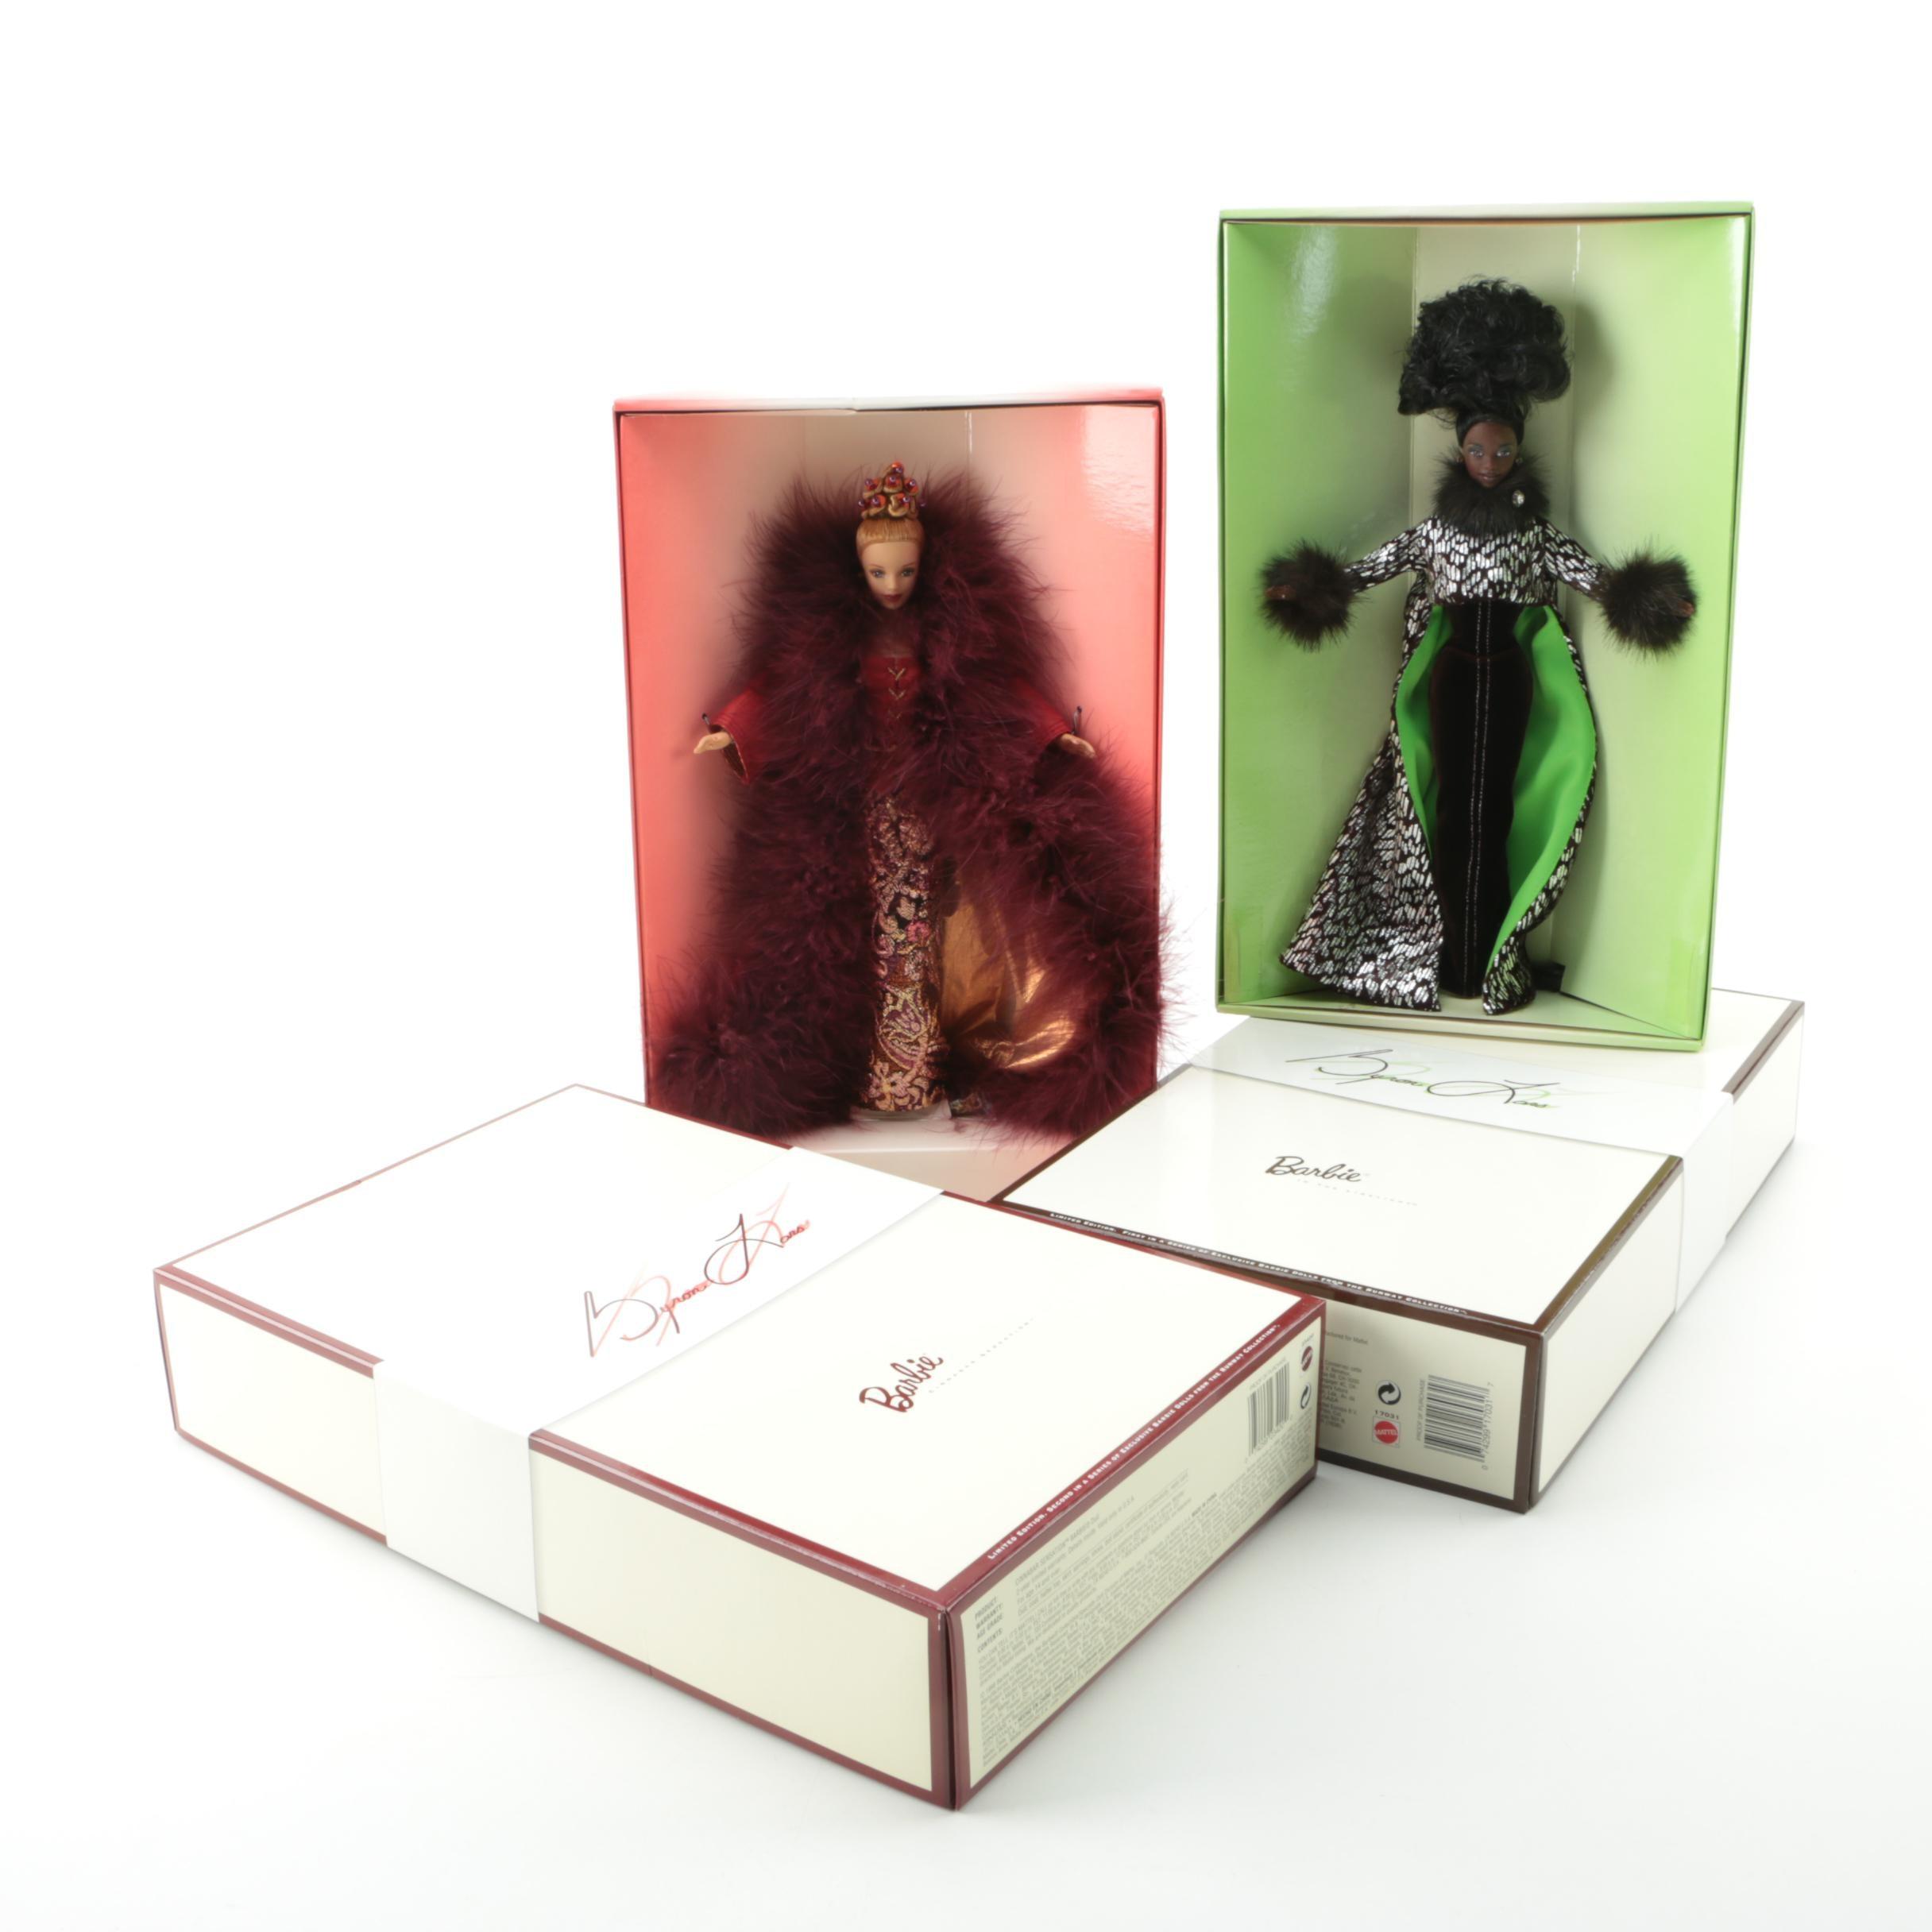 "Mattel ""Barbie in the Limelight"" Dolls by Byron Lars"